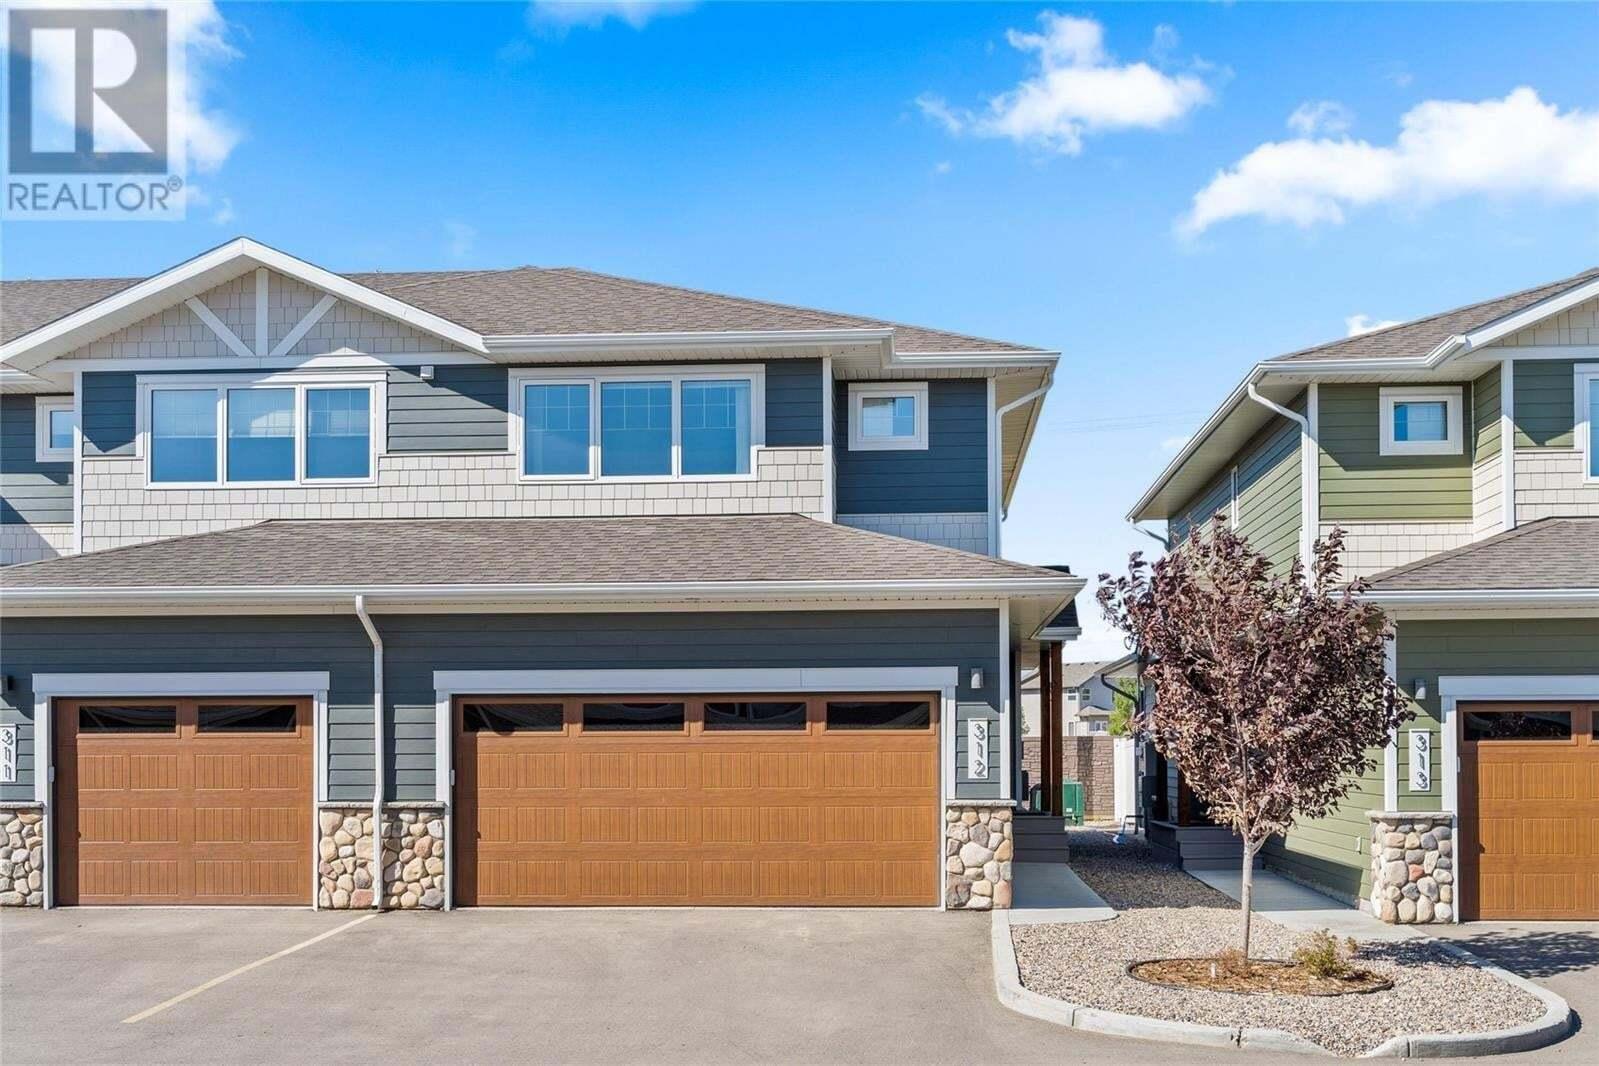 Townhouse for sale at 4000 Sandhill Cres Unit 312 Regina Saskatchewan - MLS: SK826674